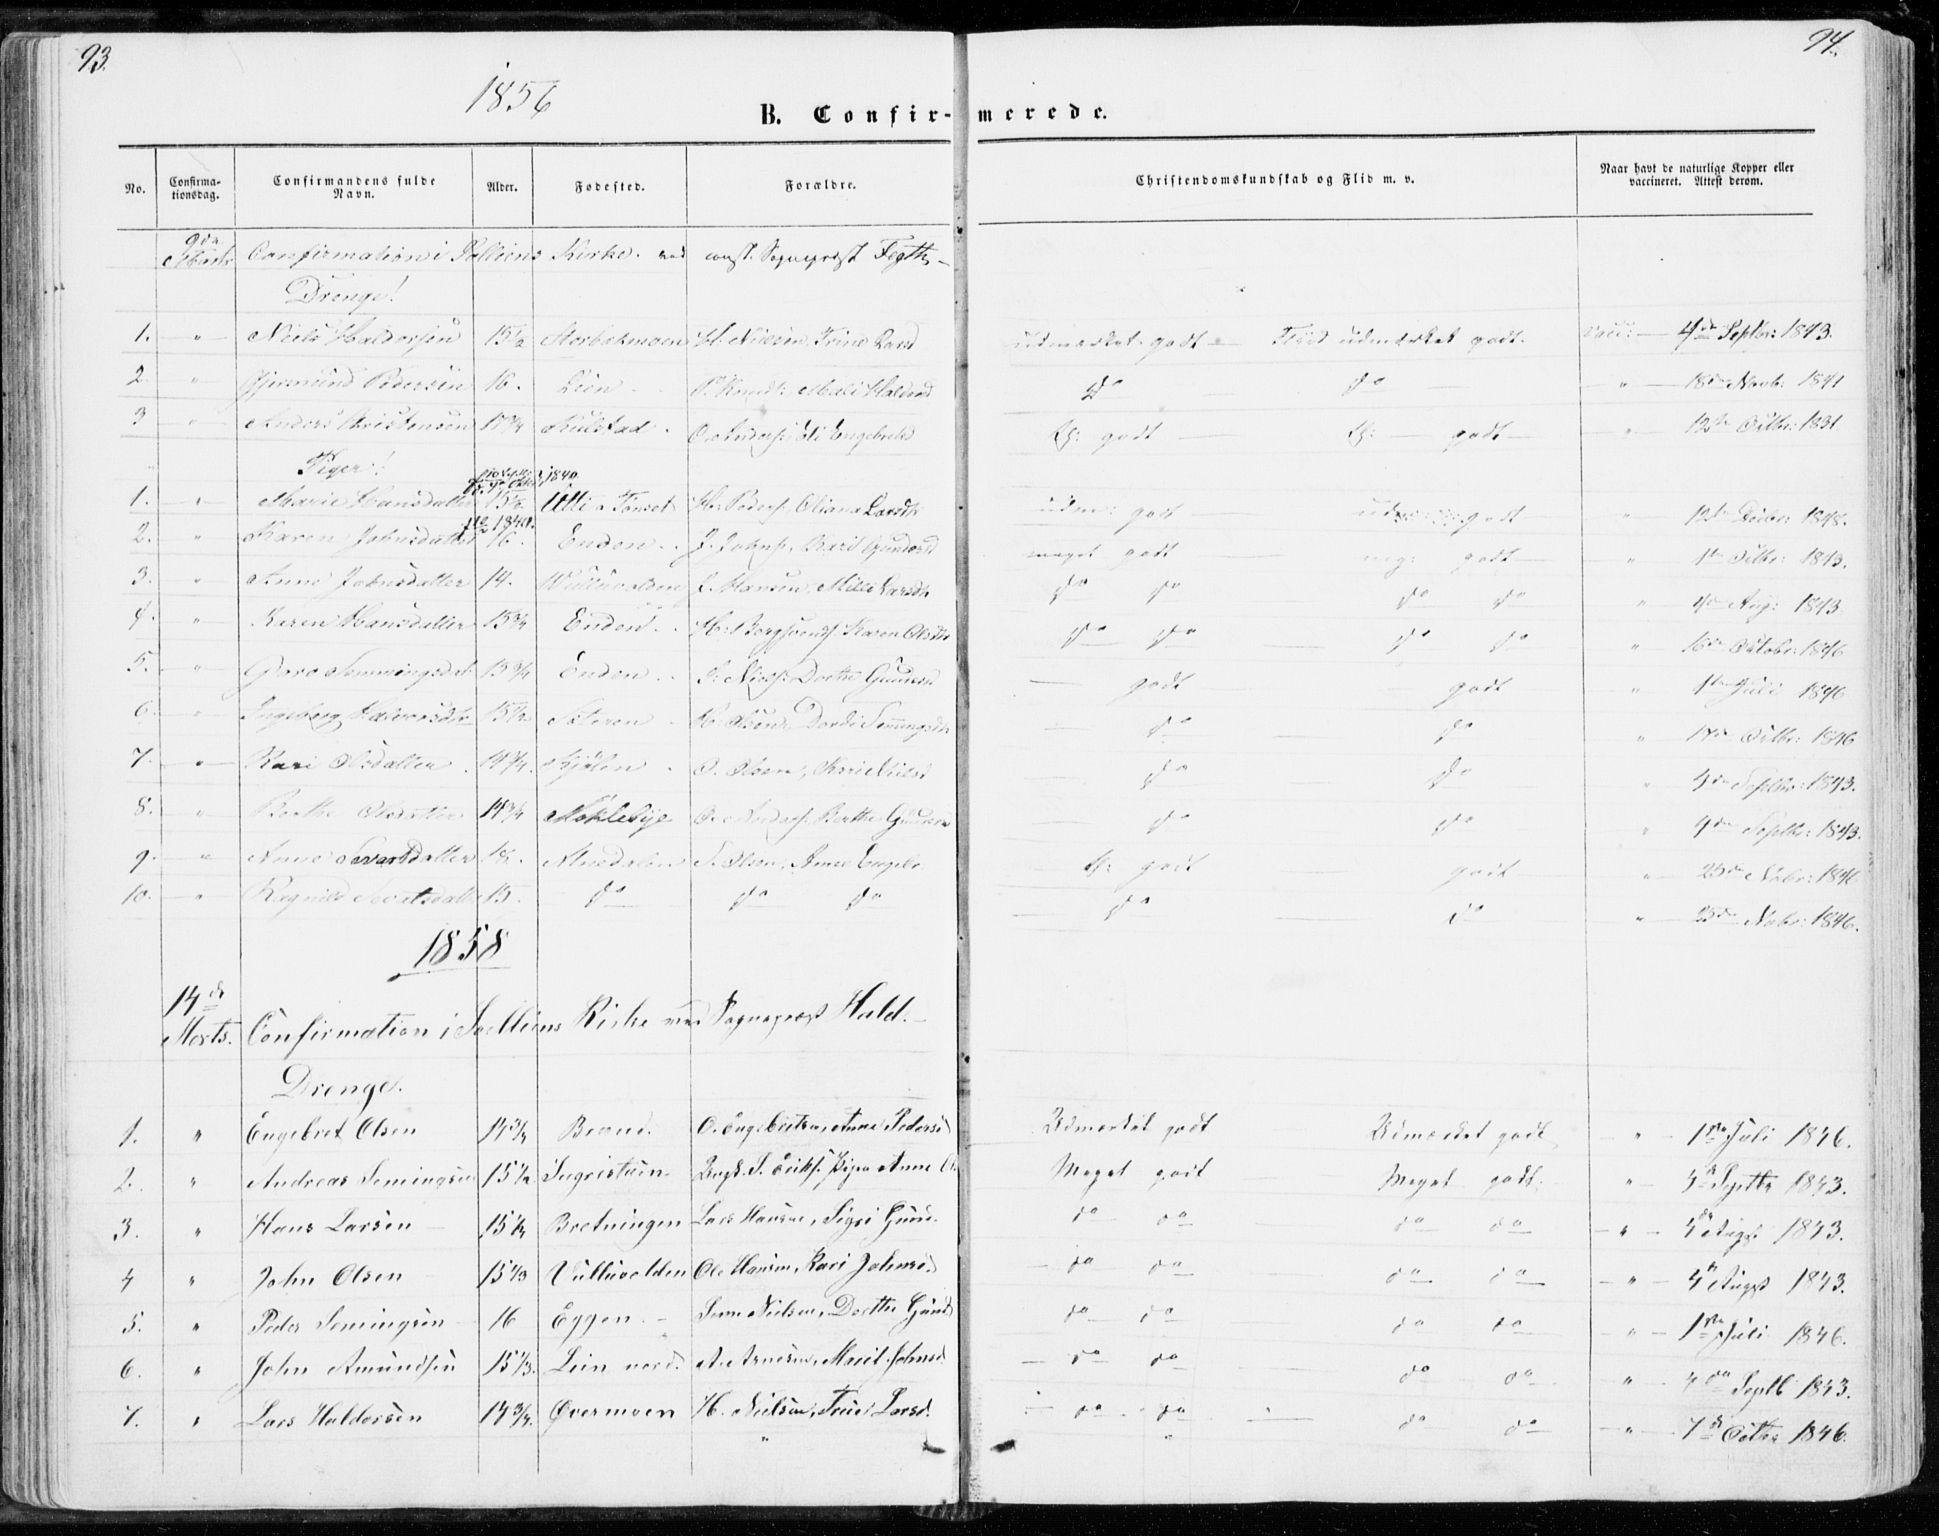 SAH, Sollia prestekontor, Ministerialbok nr. 1, 1856-1885, s. 93-94